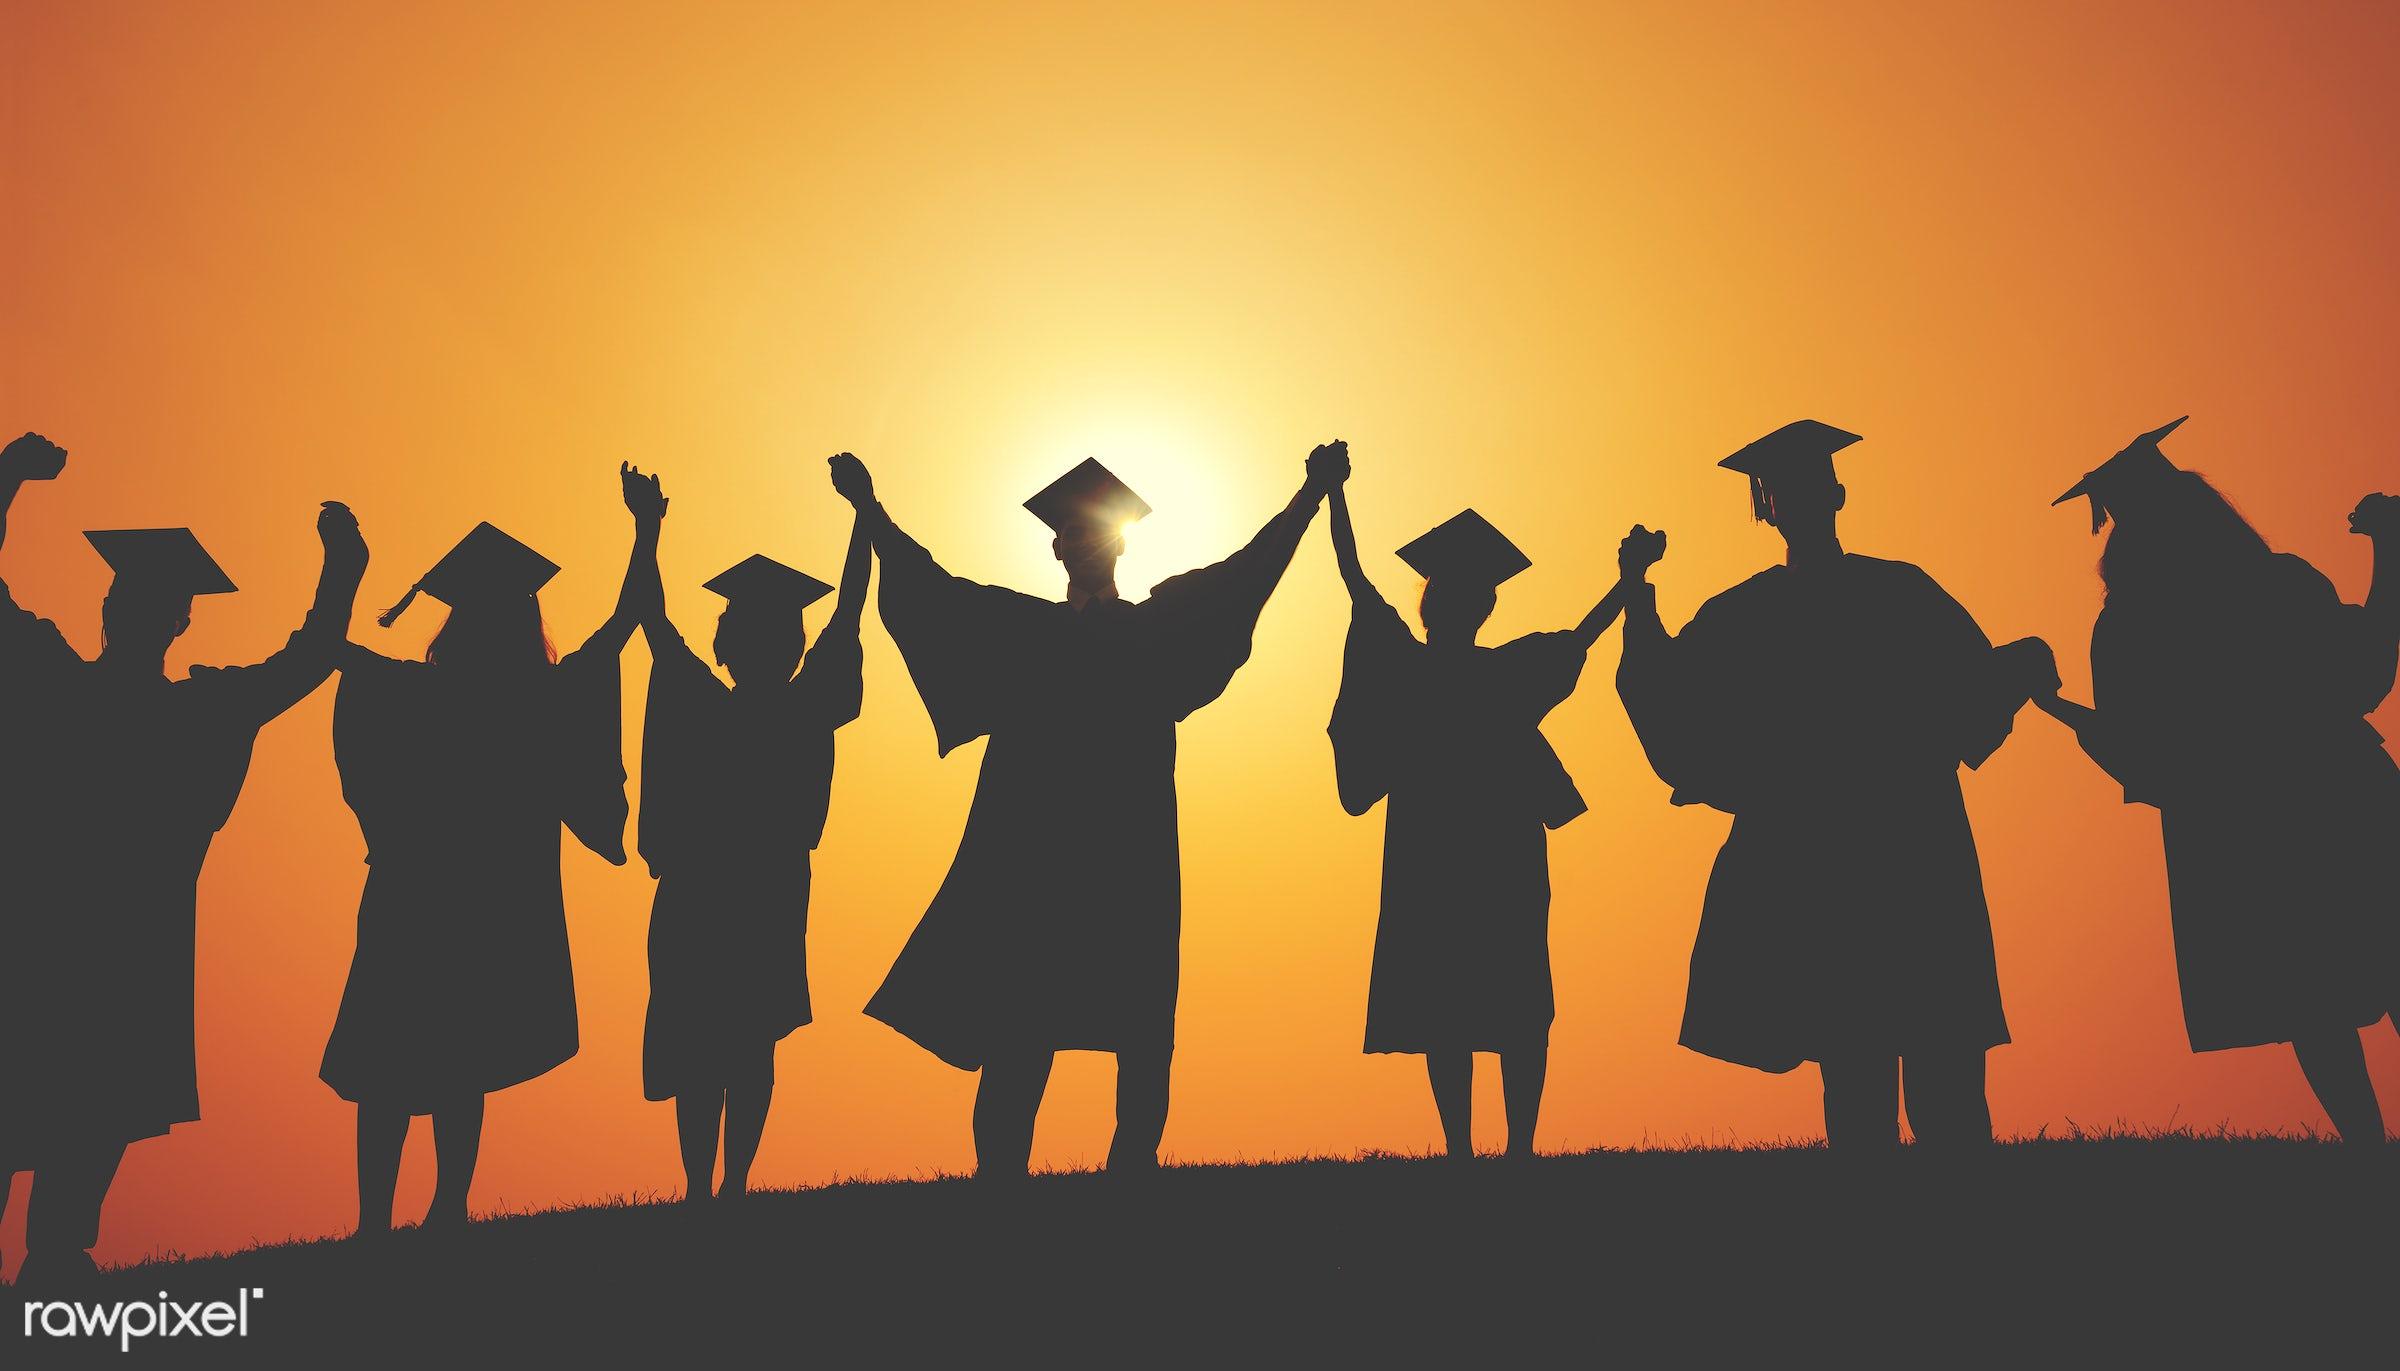 holding, academic, back lit, celebration, college, education, field, finished, gown, graduate, graduation, graduation cap,...